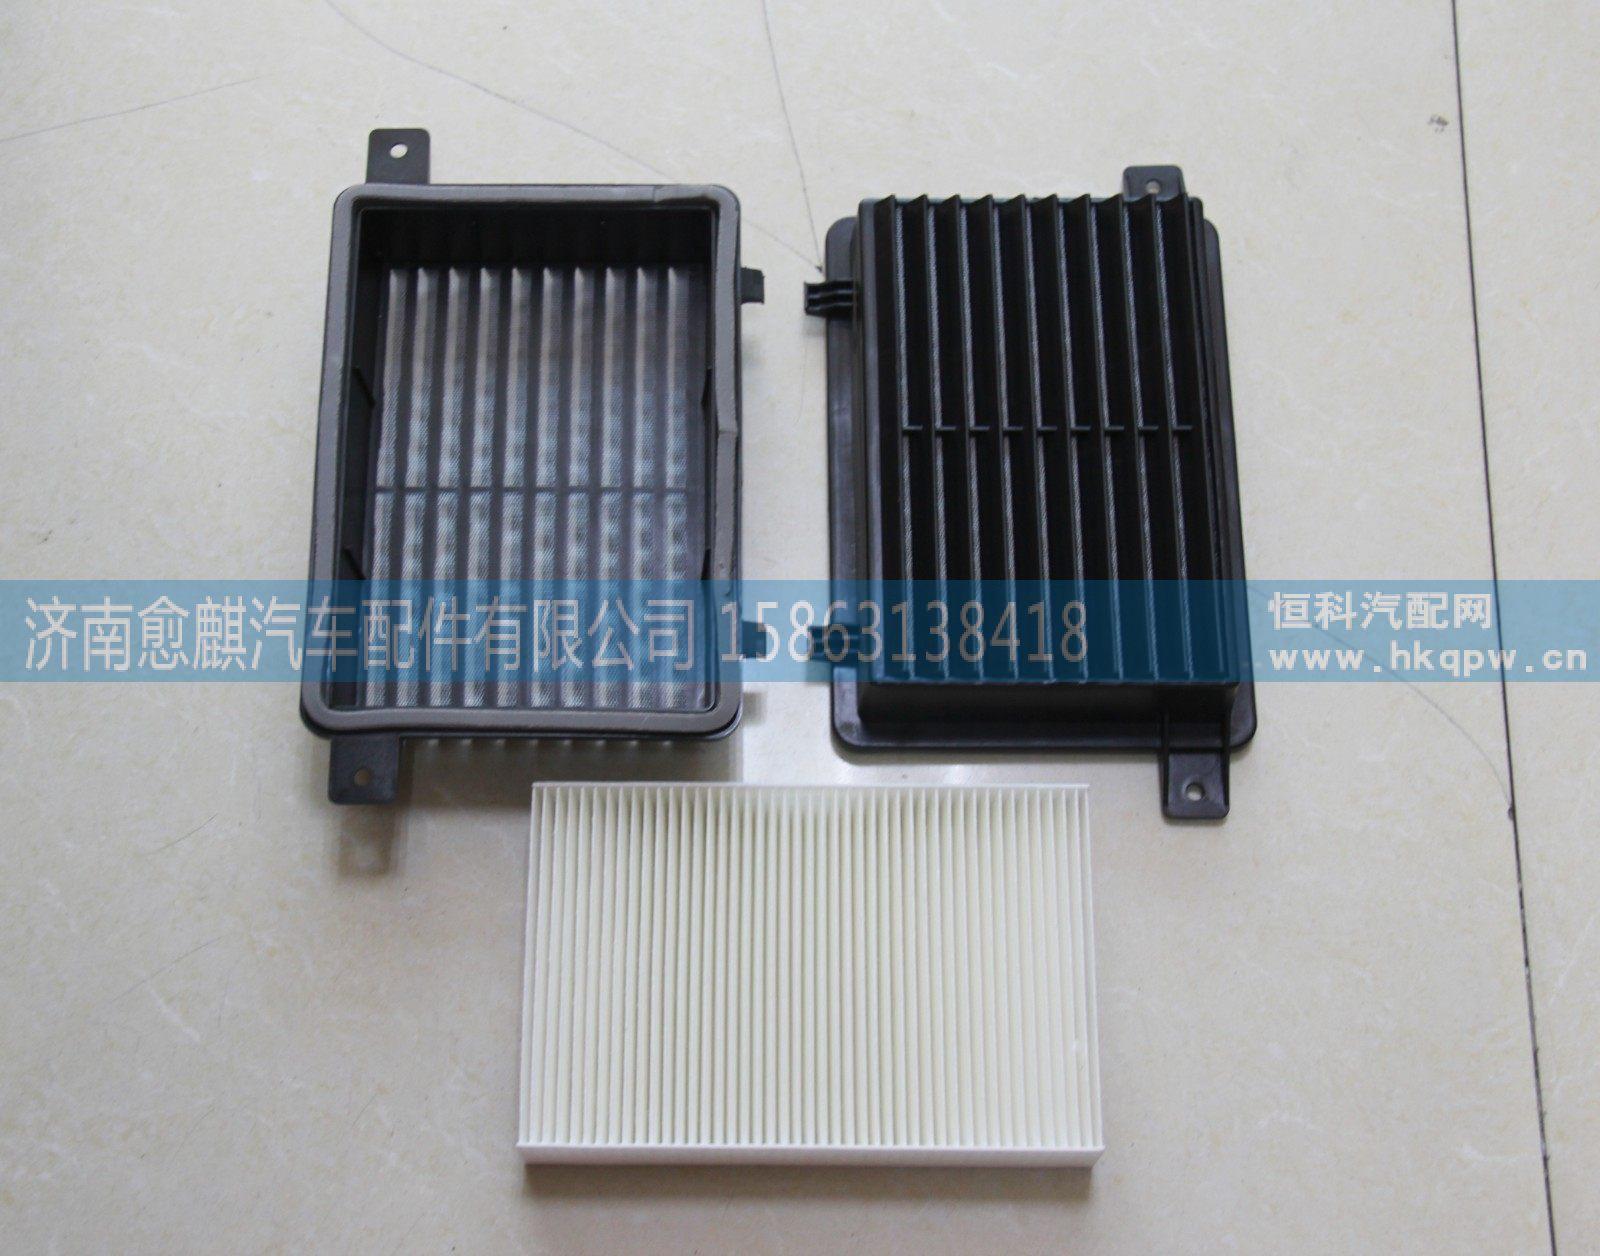 HOWO矿车空调滤网 WG1642820061/WG1642820061